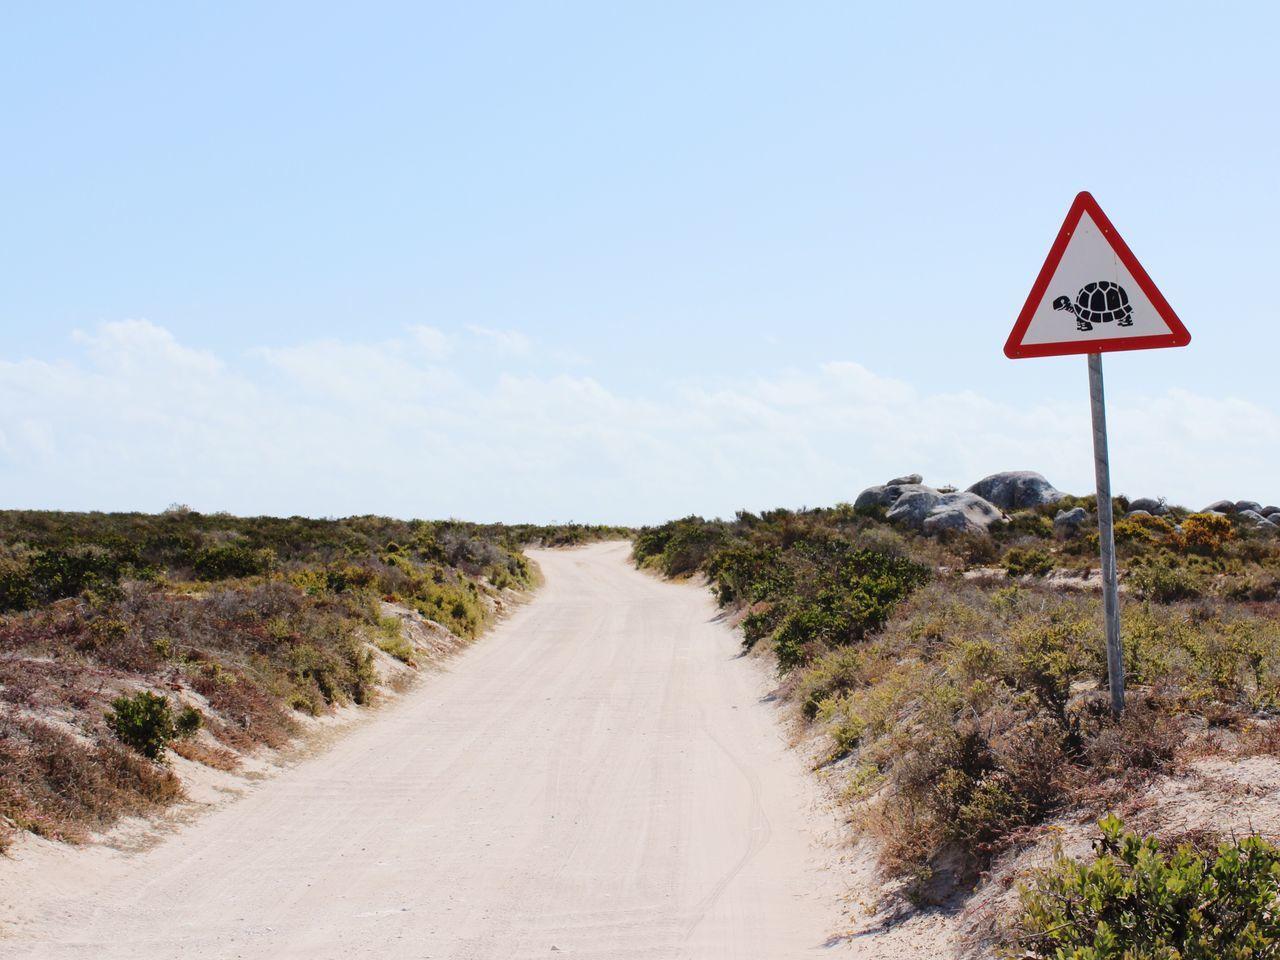 Watch out for tortoises! 🐢 Schildkröte Tortoise South Africa Road Sign Landscape Landscapes African Landscape